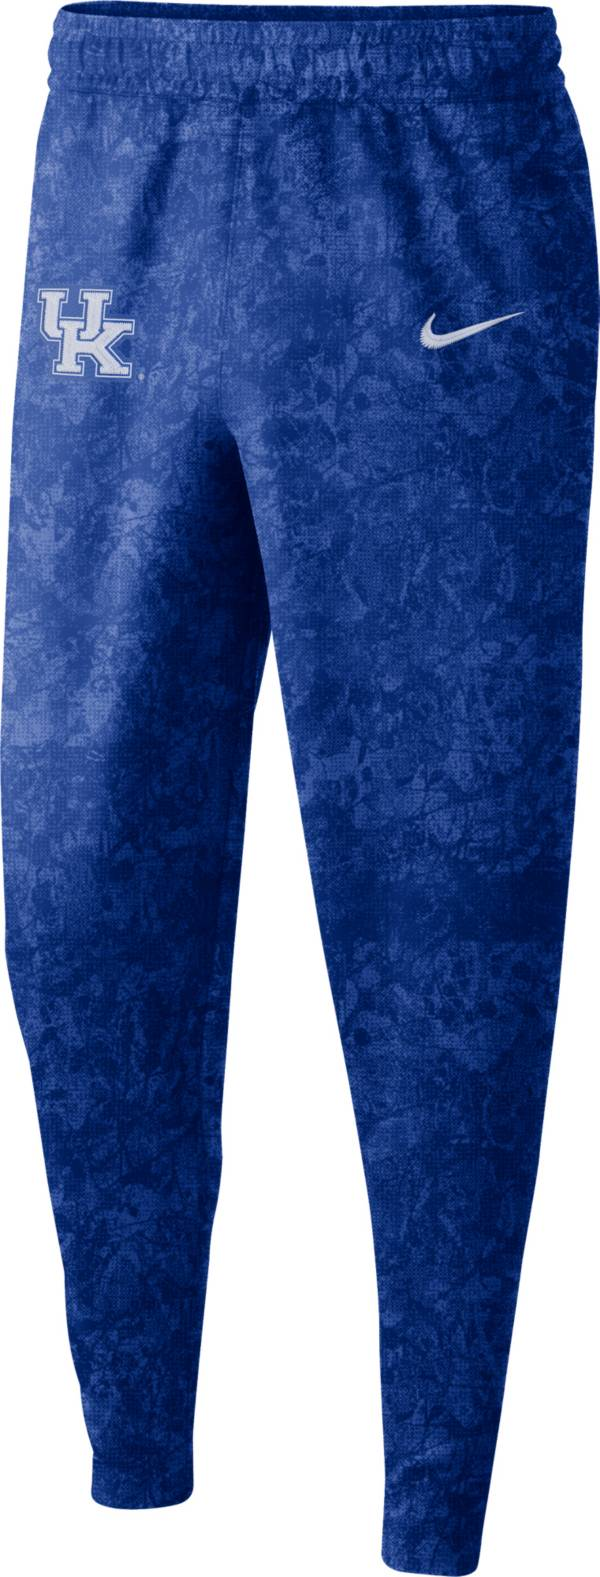 Nike Men's Kentucky Wildcats Blue Dri-FIT Spotlight Basketball Fleece Pants product image